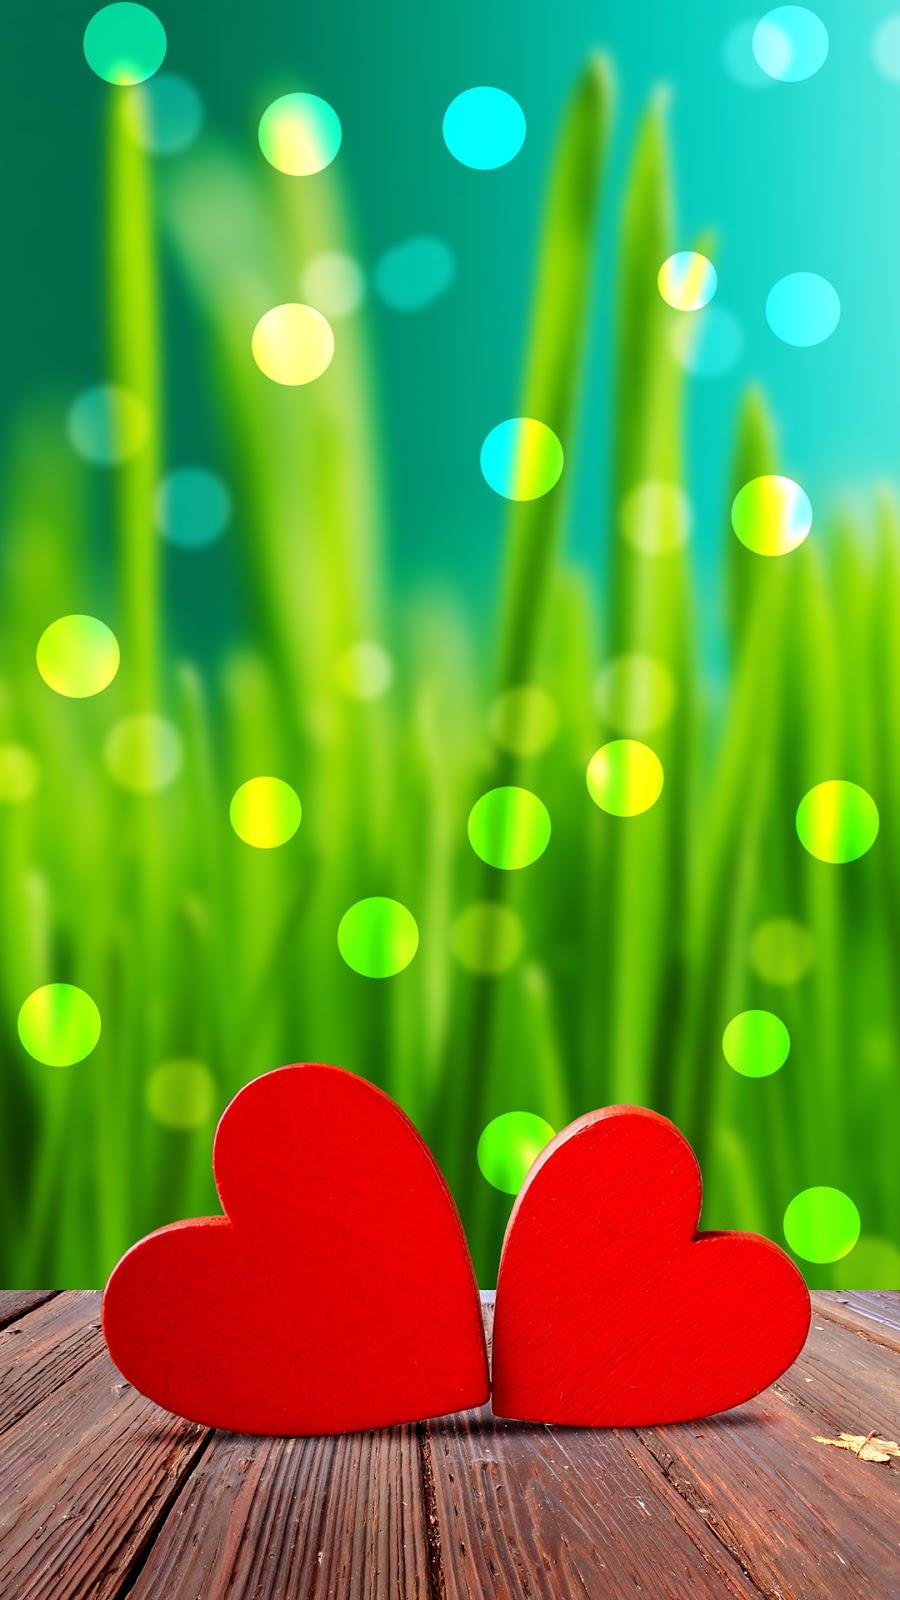 Cute Love Wallpaper Iphone - Iphone Cute Love Wallpaper Hd - HD Wallpaper